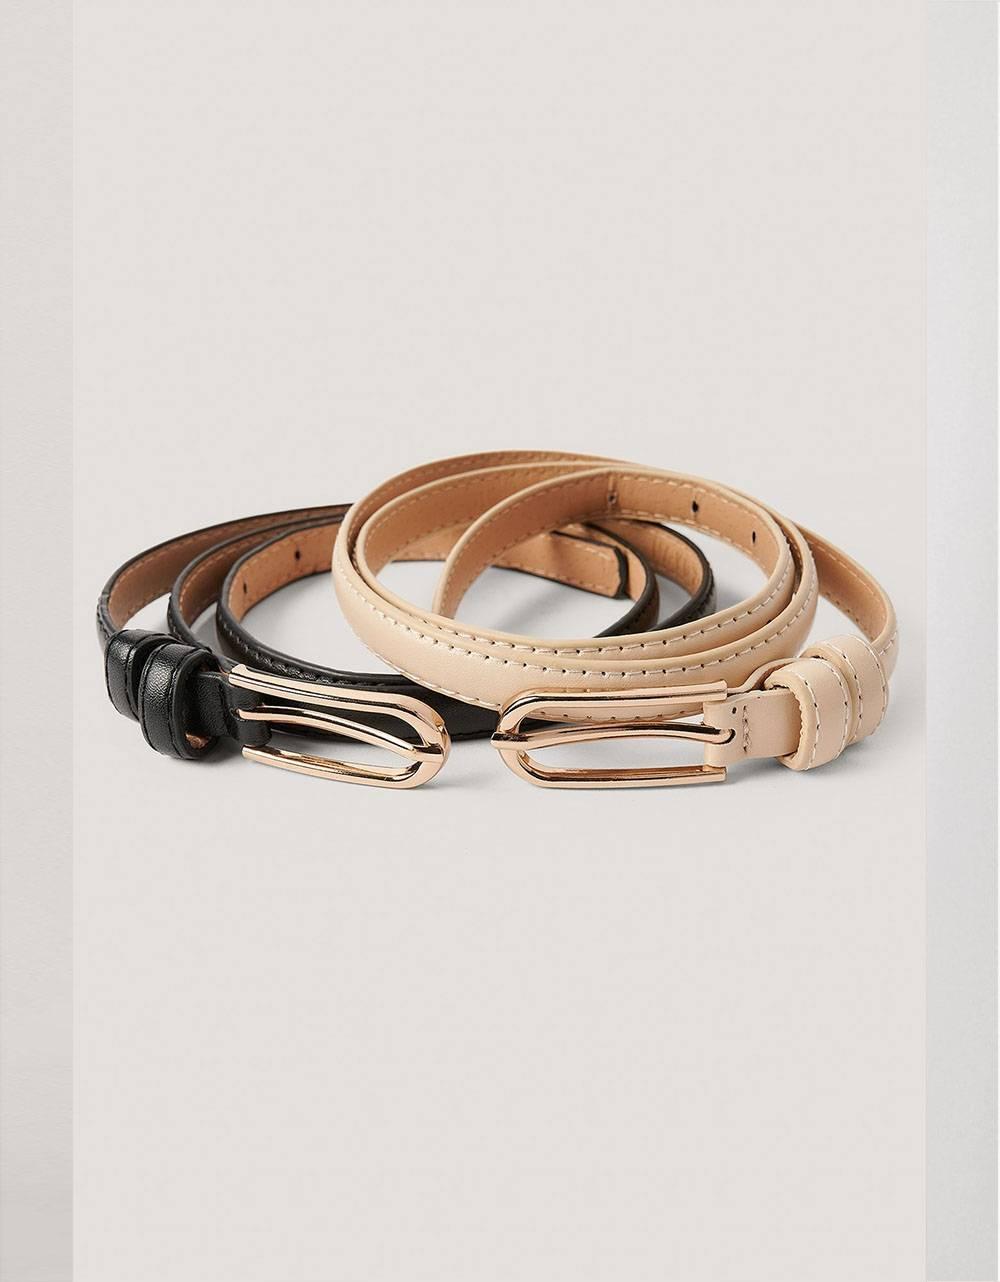 NA-KD double pack oval buckle belt - black/beige NA-KD ACCESSORIES 22,13€